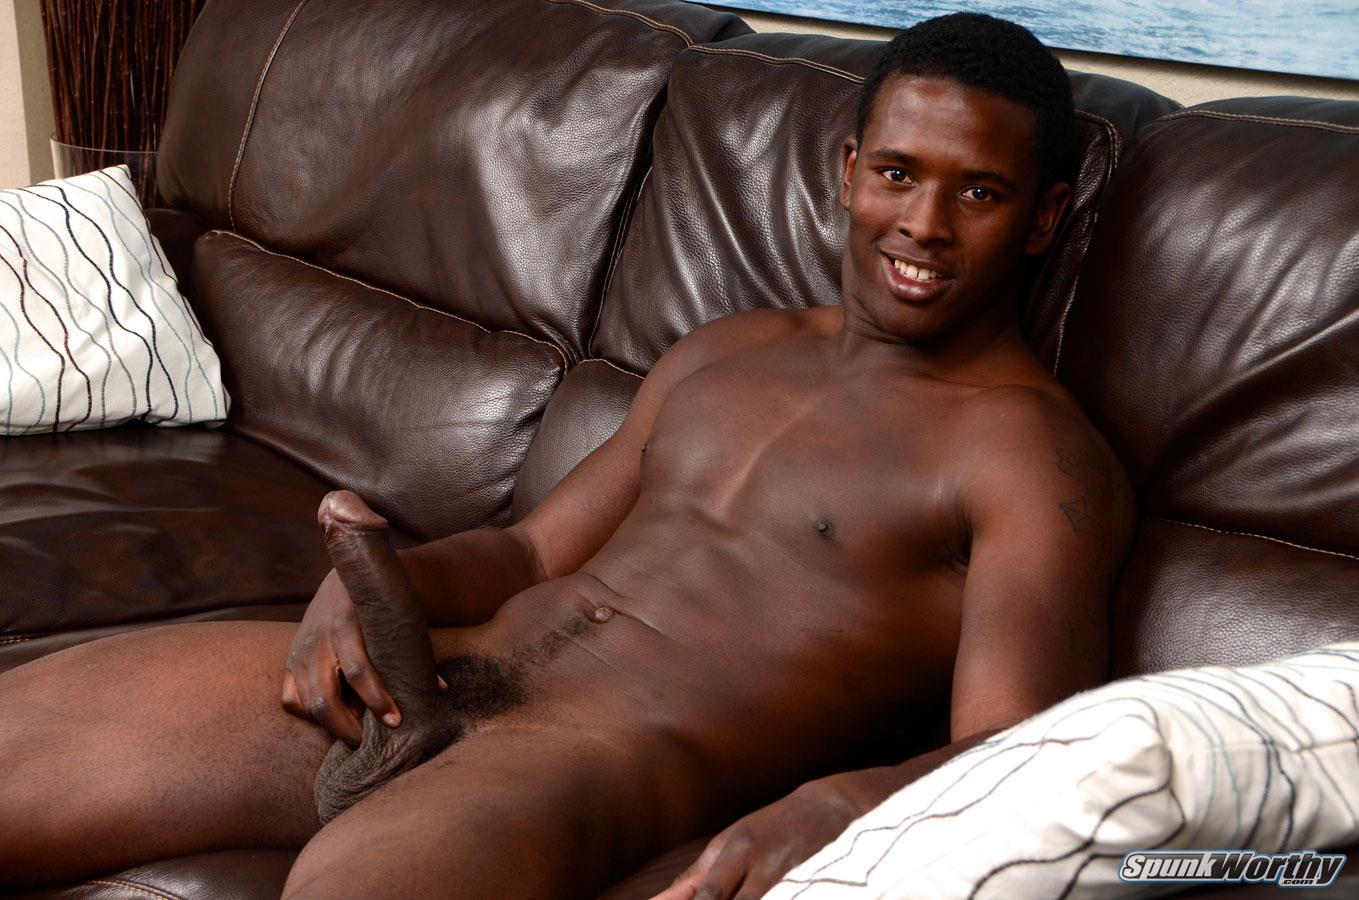 SpunkWorthy-Heath-Naked-College-Football-Player-Stroking-His-Big-Black-Cock-Amateur-Gay-Porn-05 Straight College Football Player Jerking His Big Uncut Black Cock